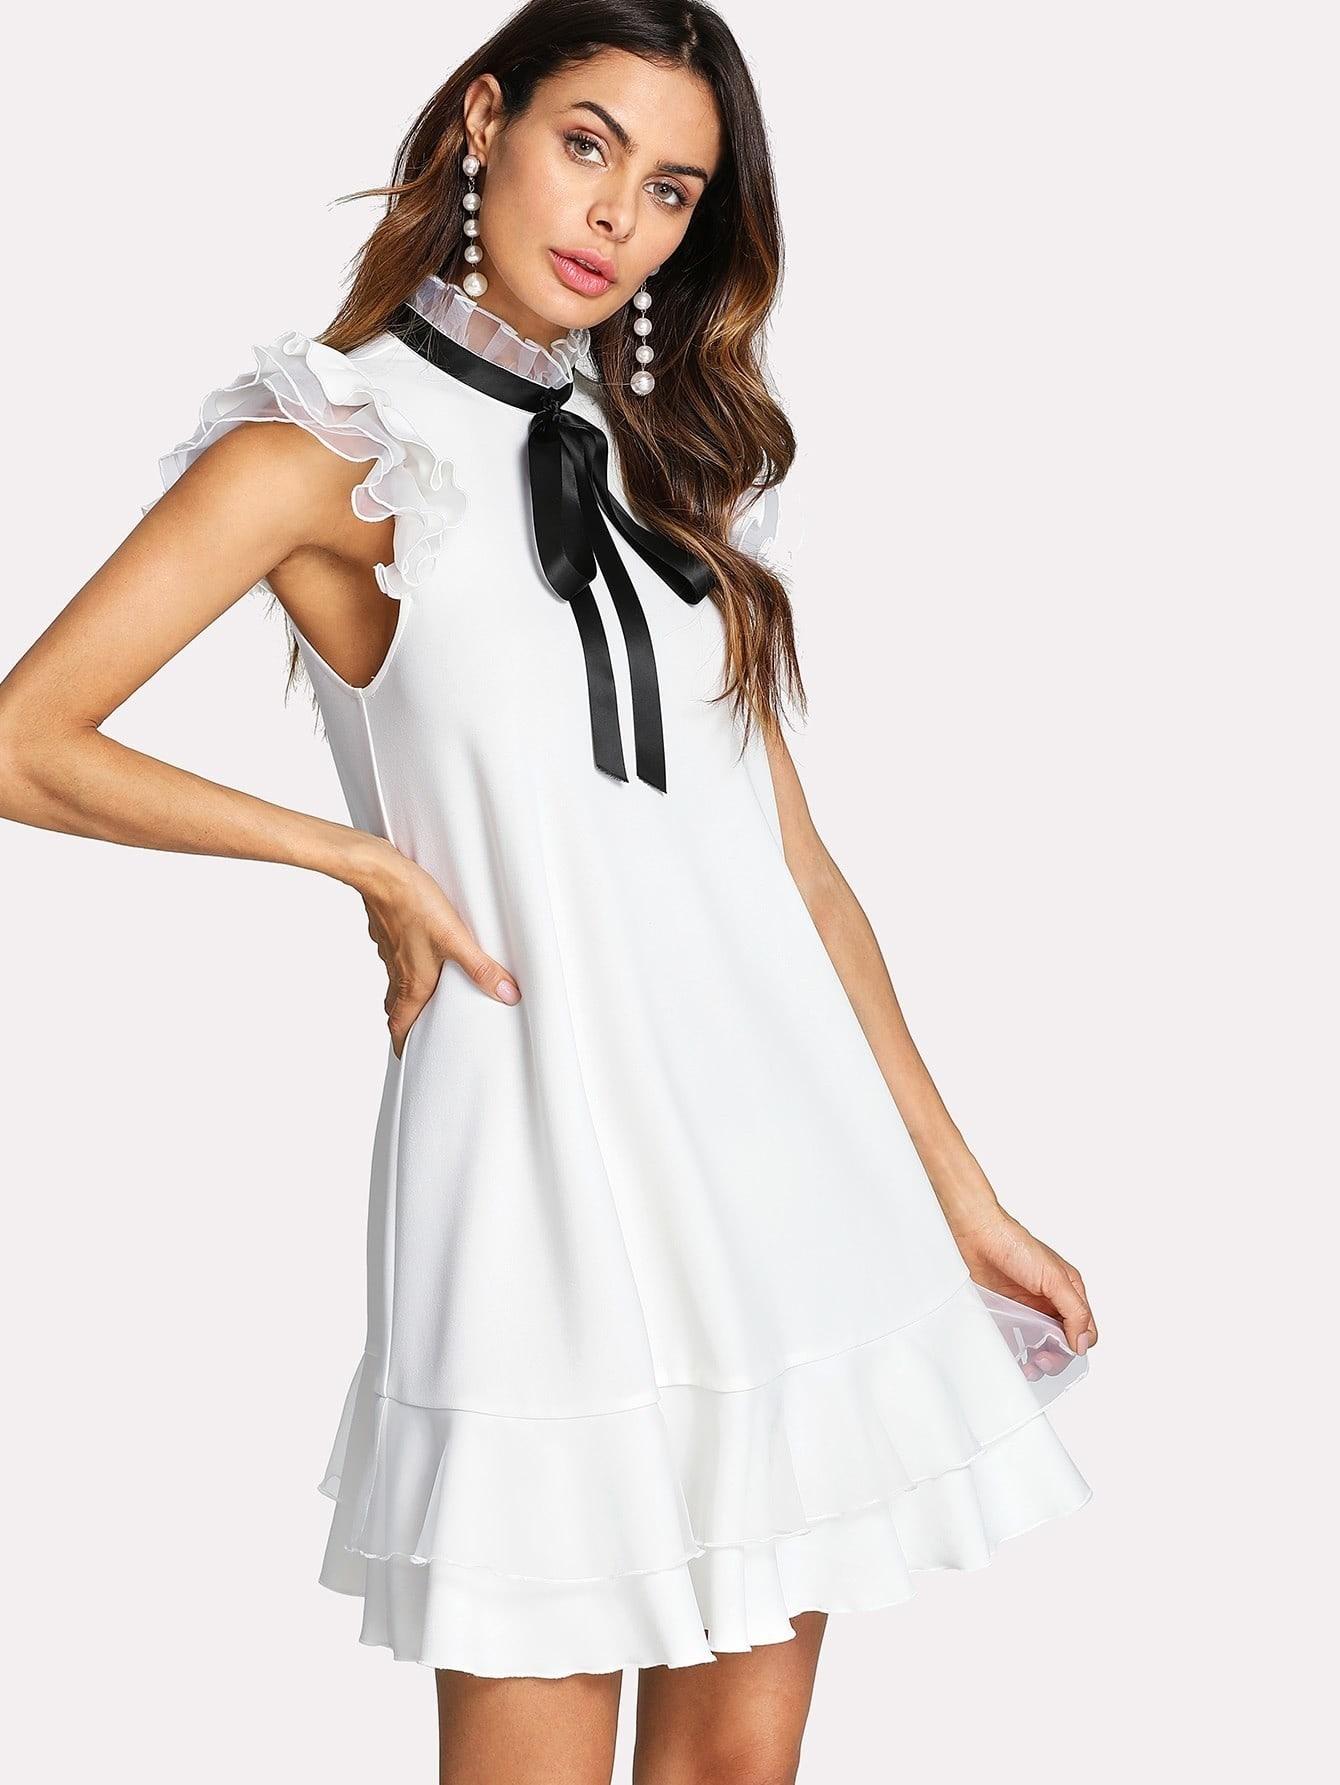 Tie Neck Frill Trim Layered Hem Dress black one shoulder frill layered design jumpsuit